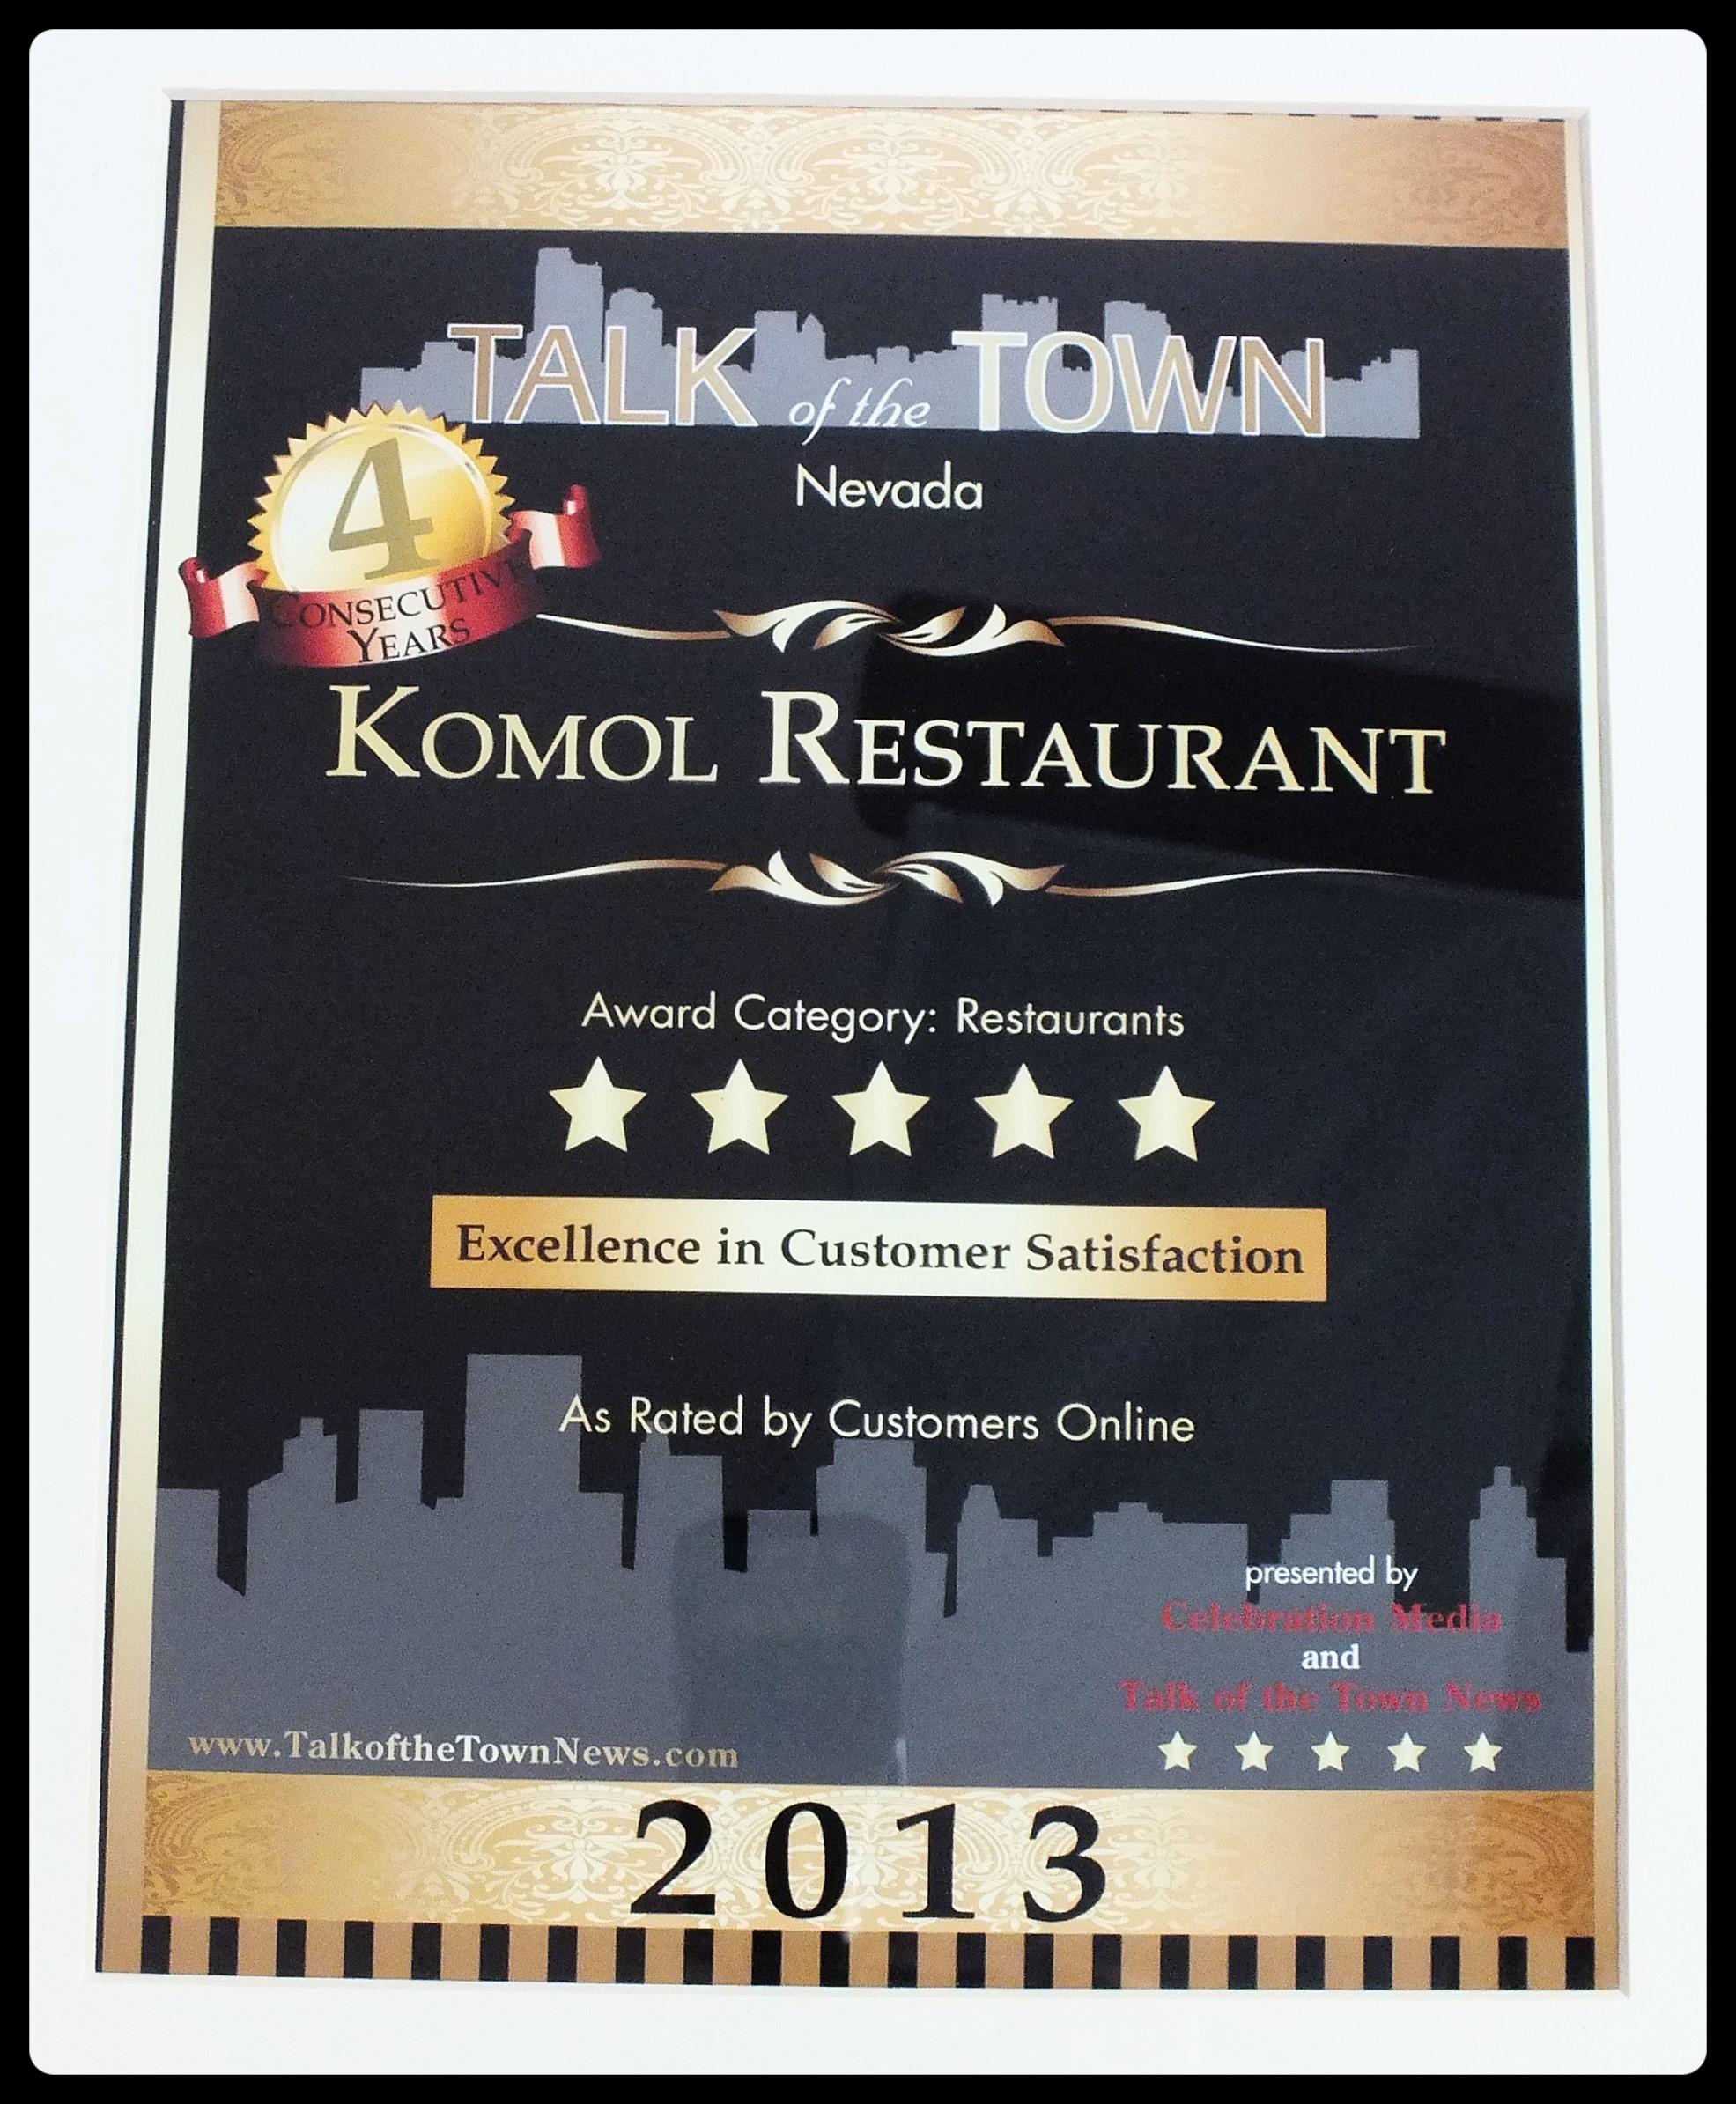 Komol Restaurant Menu